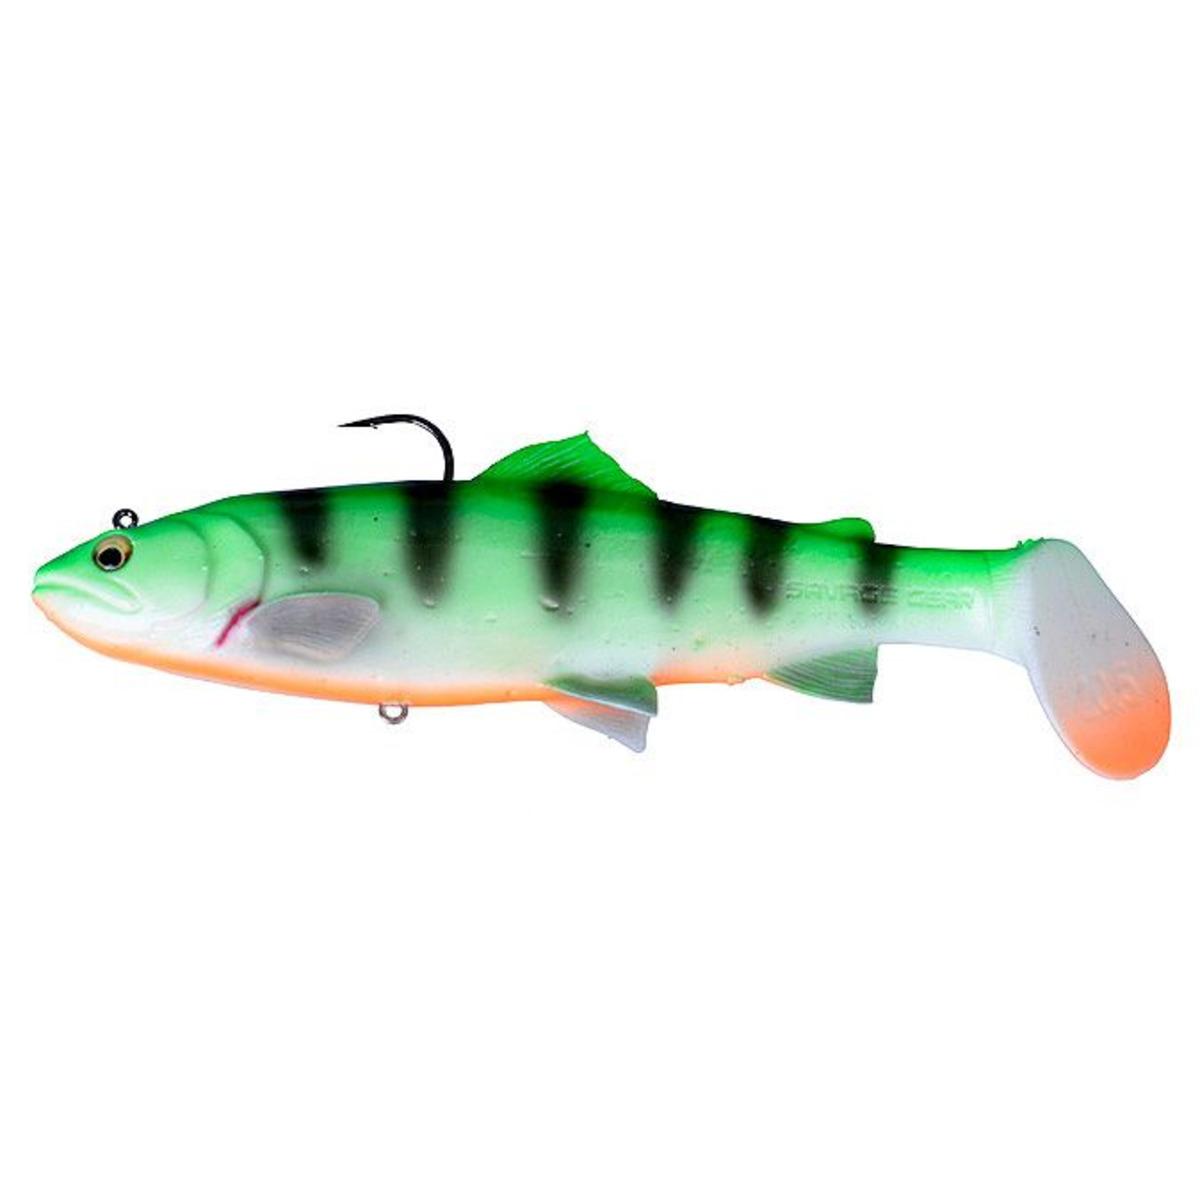 Savage Gear 3D Trout Rattle Shad - 27.5 cm - 275 g - Firetiger